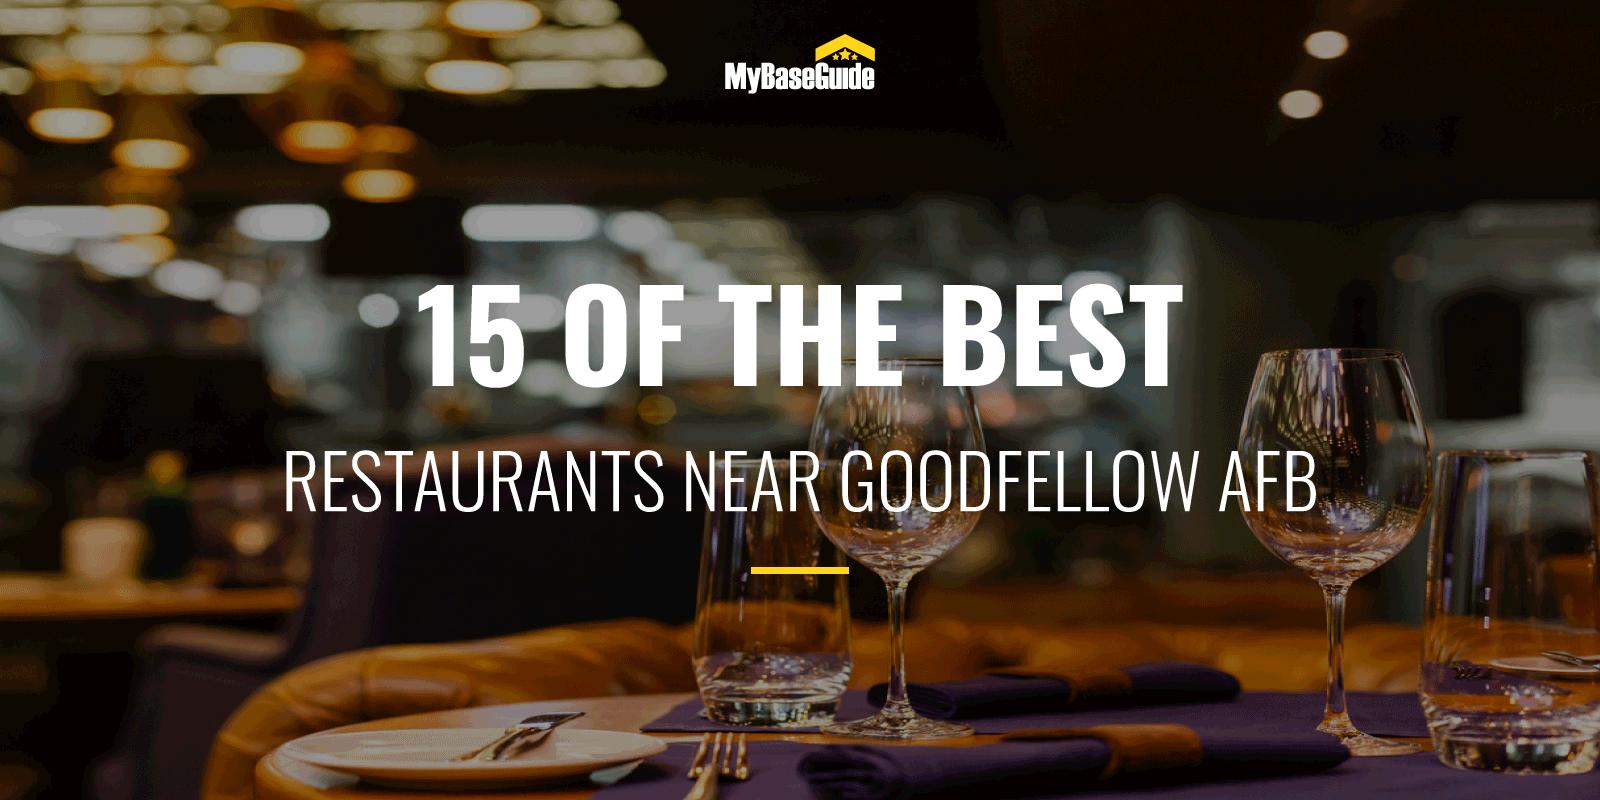 15 of the Best Restaurants Near Goodfellow AFB